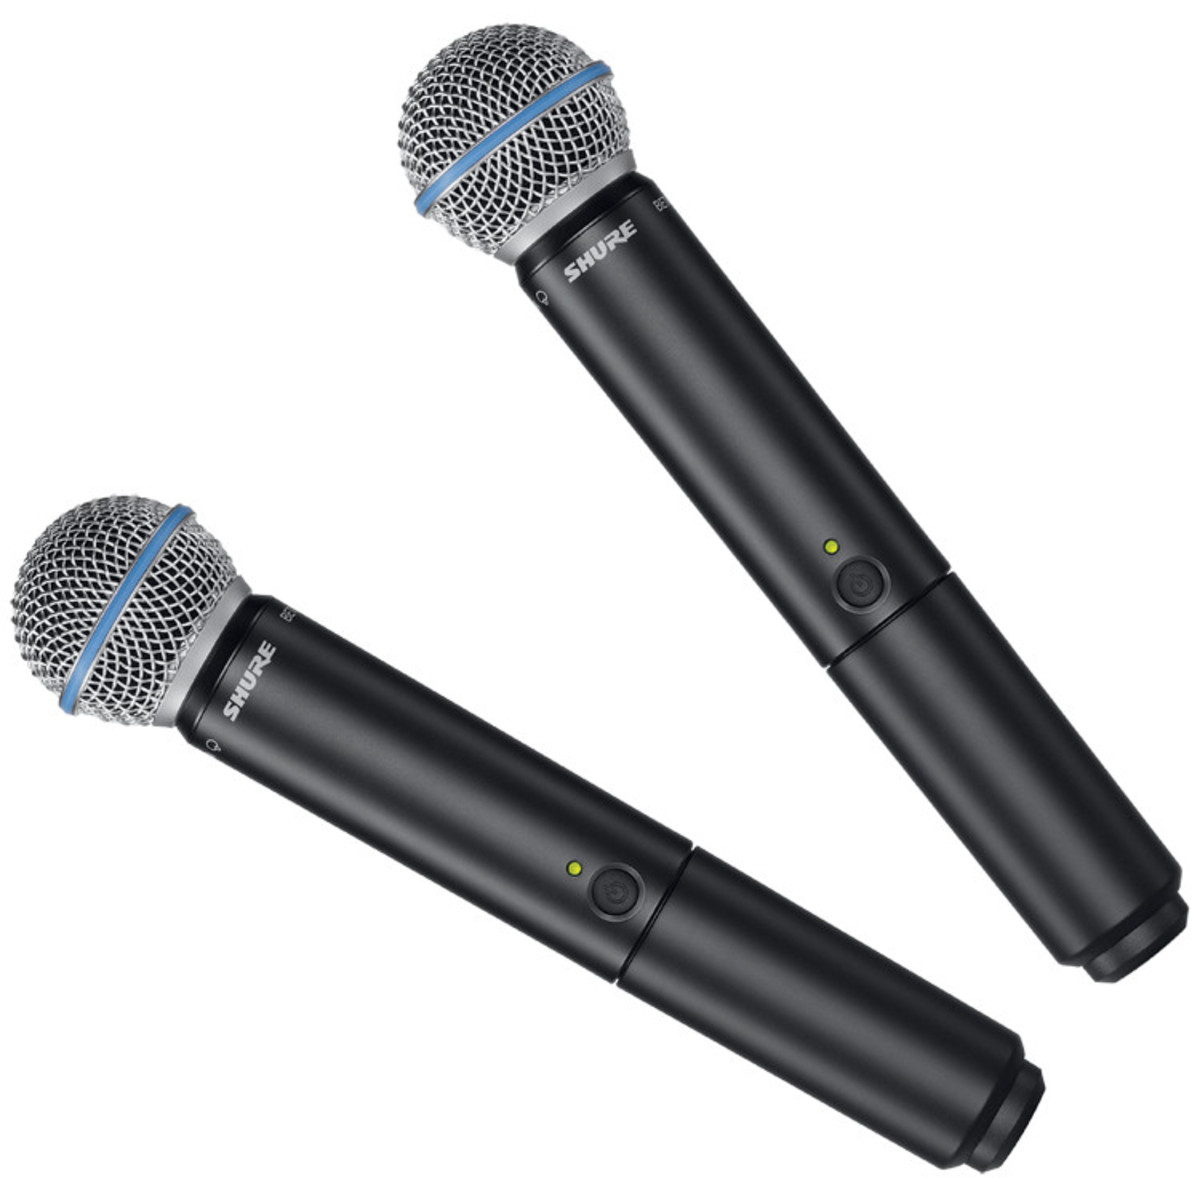 Shure BLX288UK B58 Beta 58A Dual Handheld Wireless Microphone System